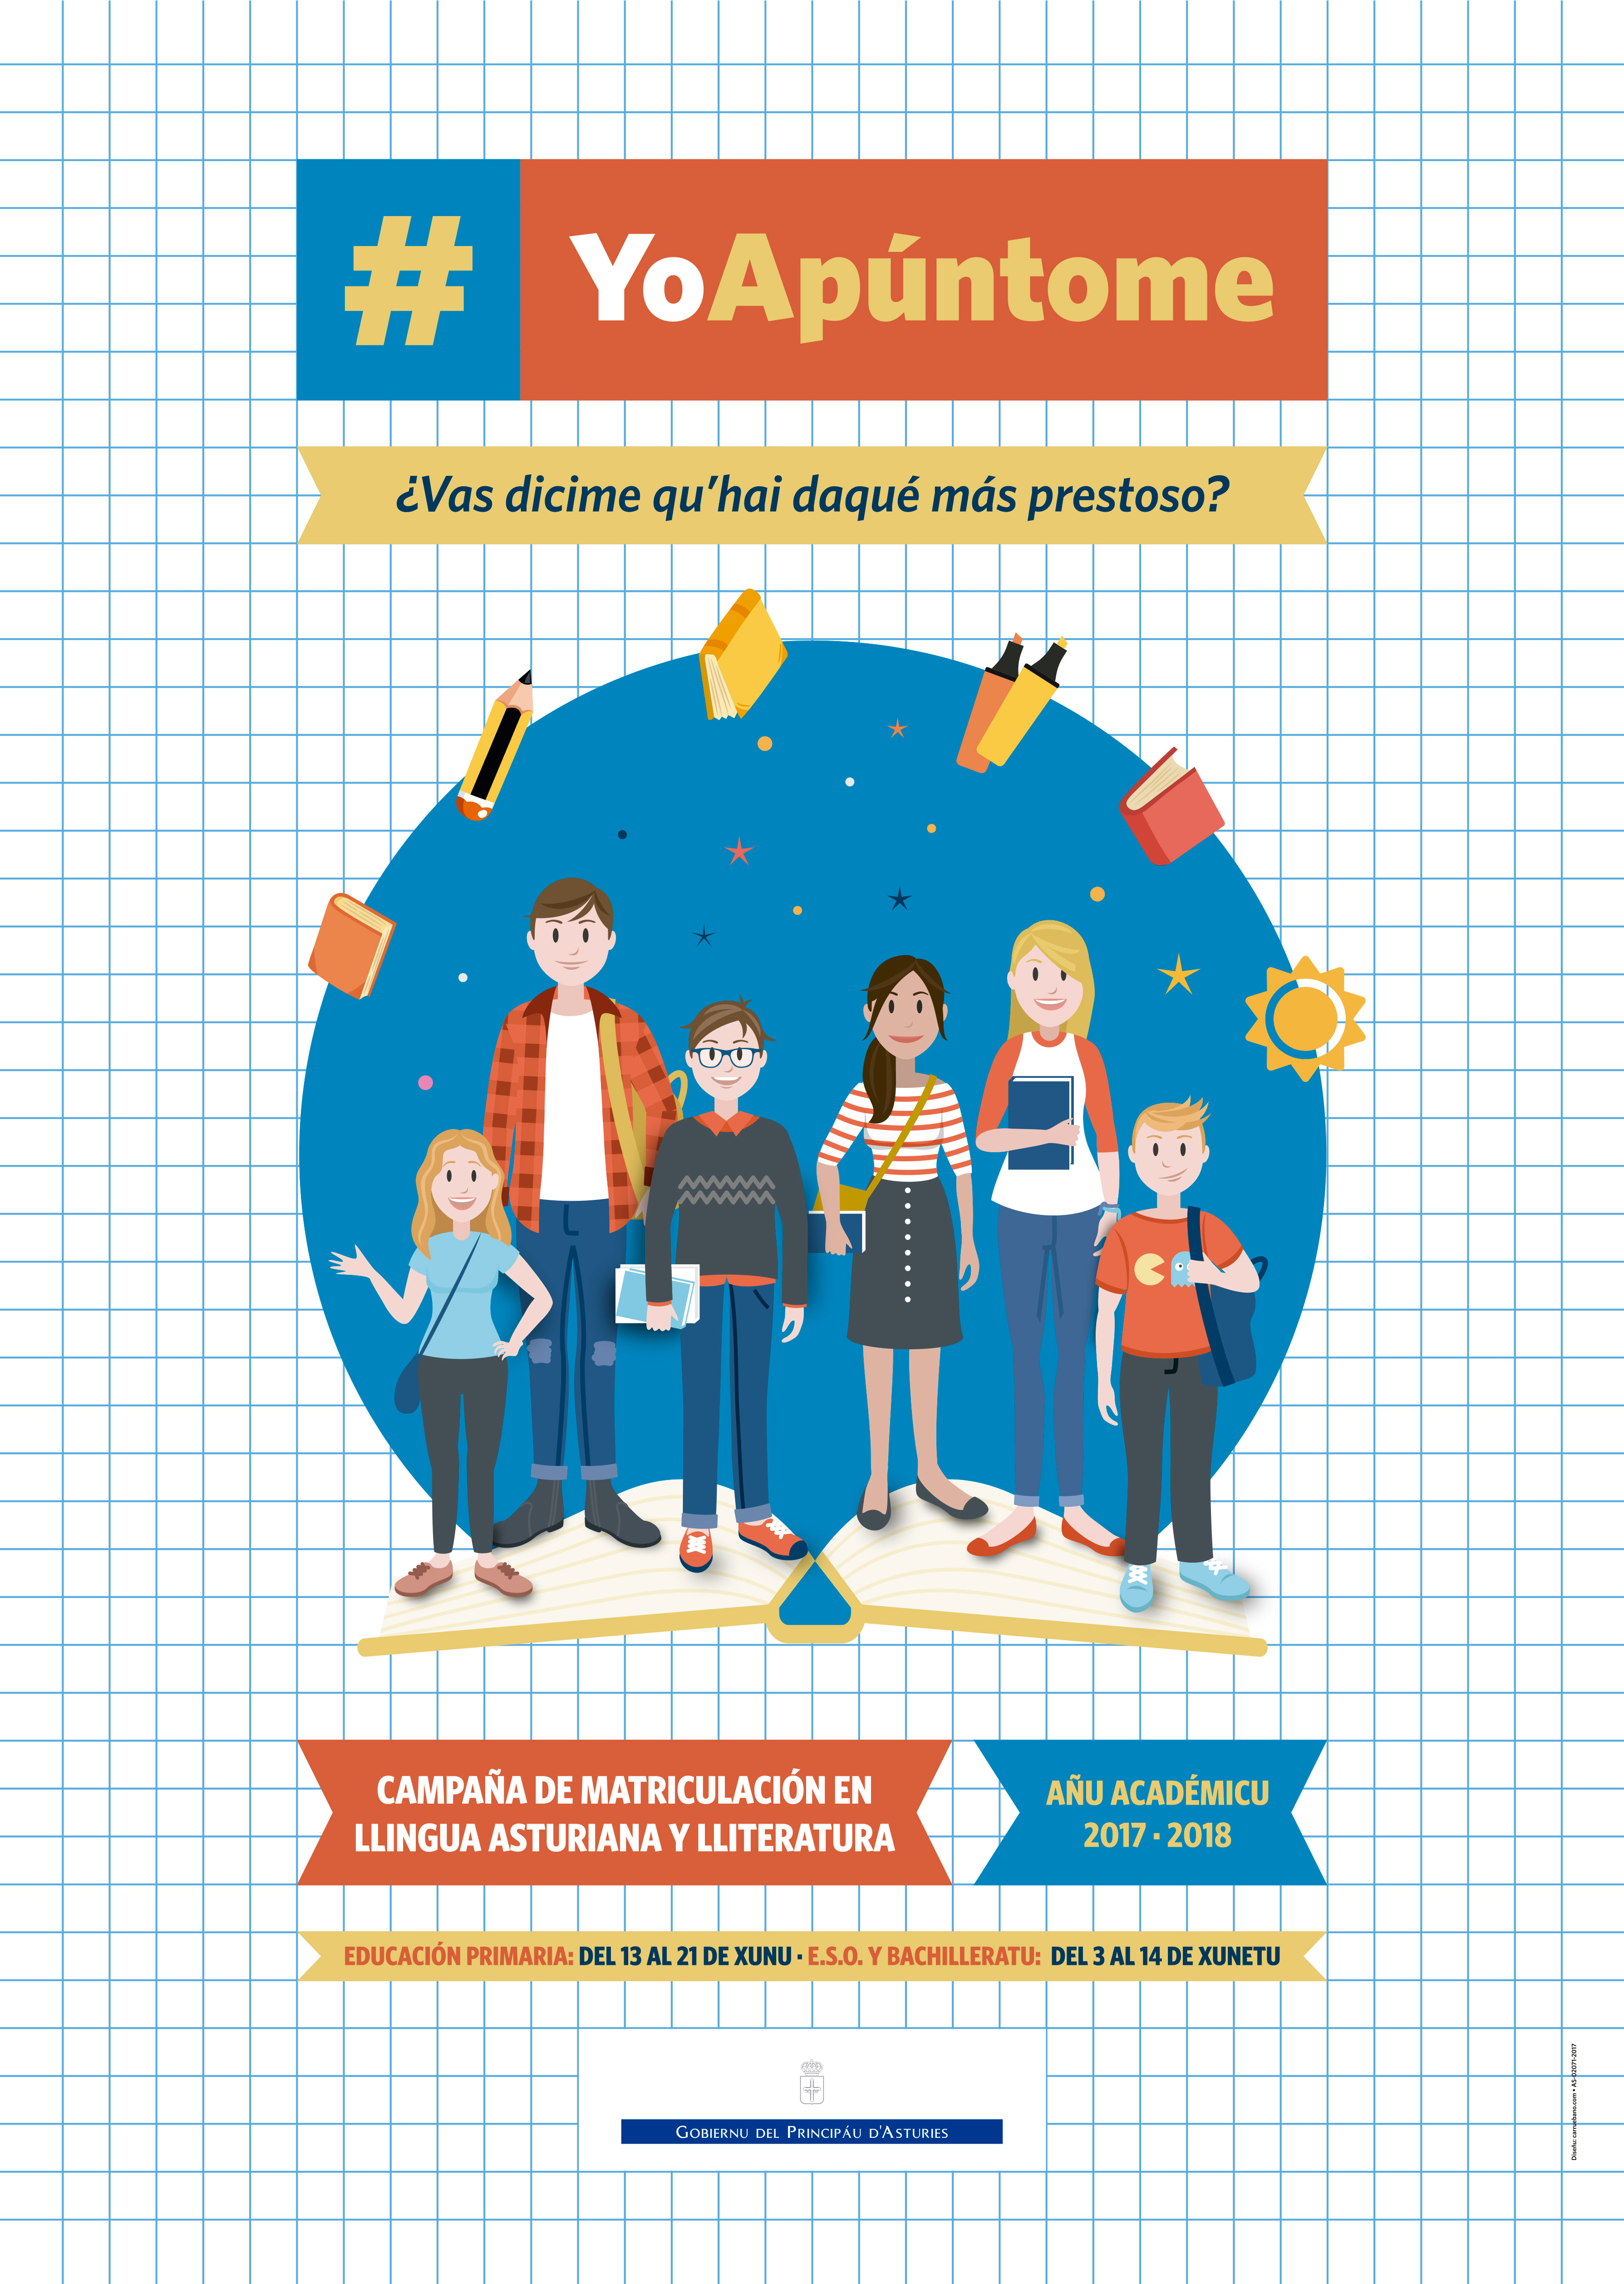 Cartelu campaña matriculación Llingua Asturiana